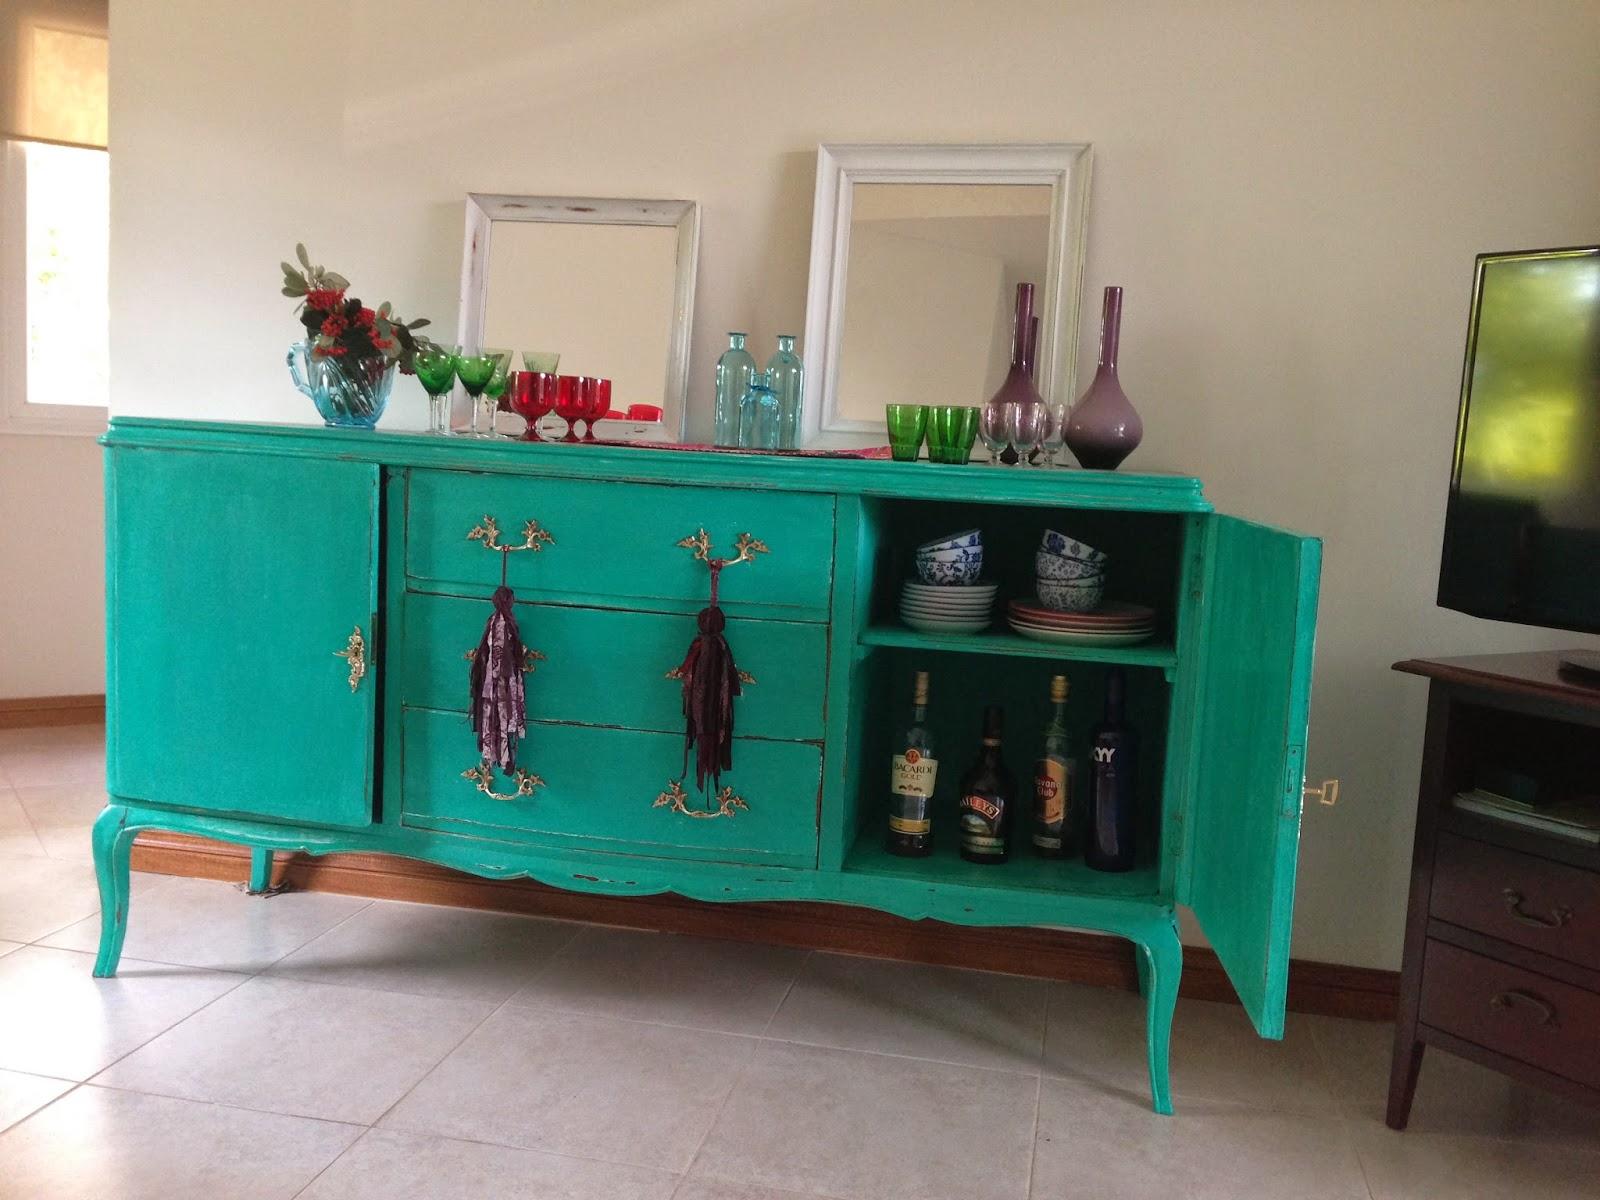 Muebles Restaurados Y Pintados Awesome Cheap Restaurados Pintados  # Muebles Turquesa